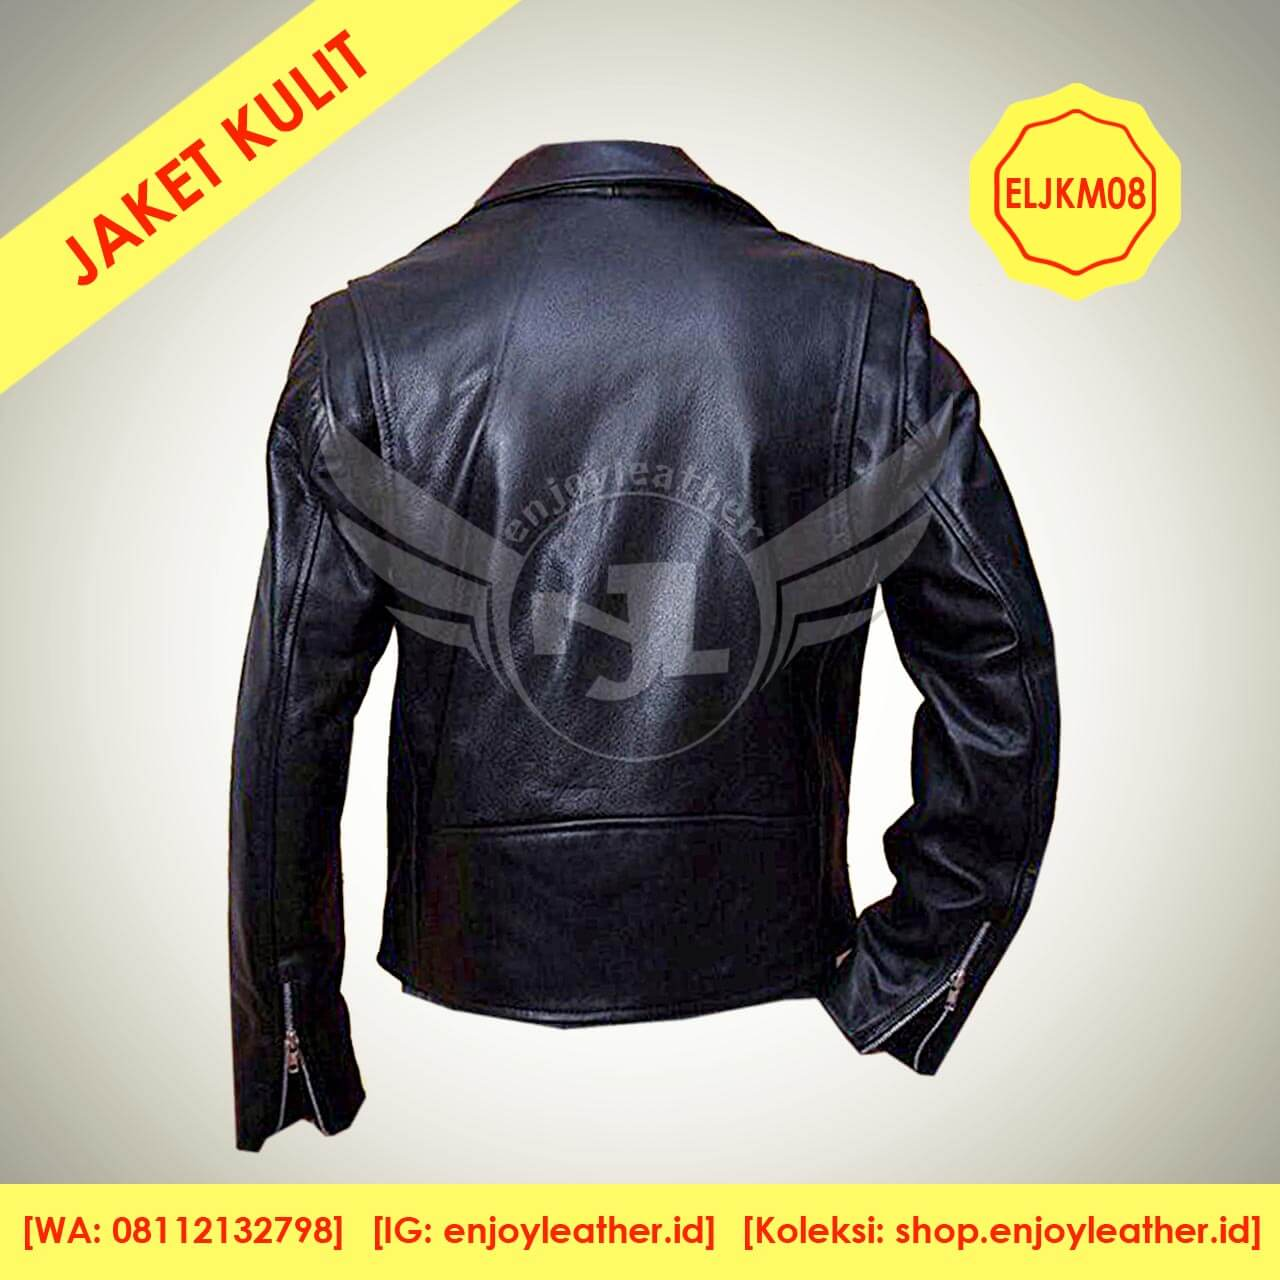 Jaket Kulit Anak Muda Keren Desain dan Model Terbaru Asli Garut ELJKM08 835c81649e